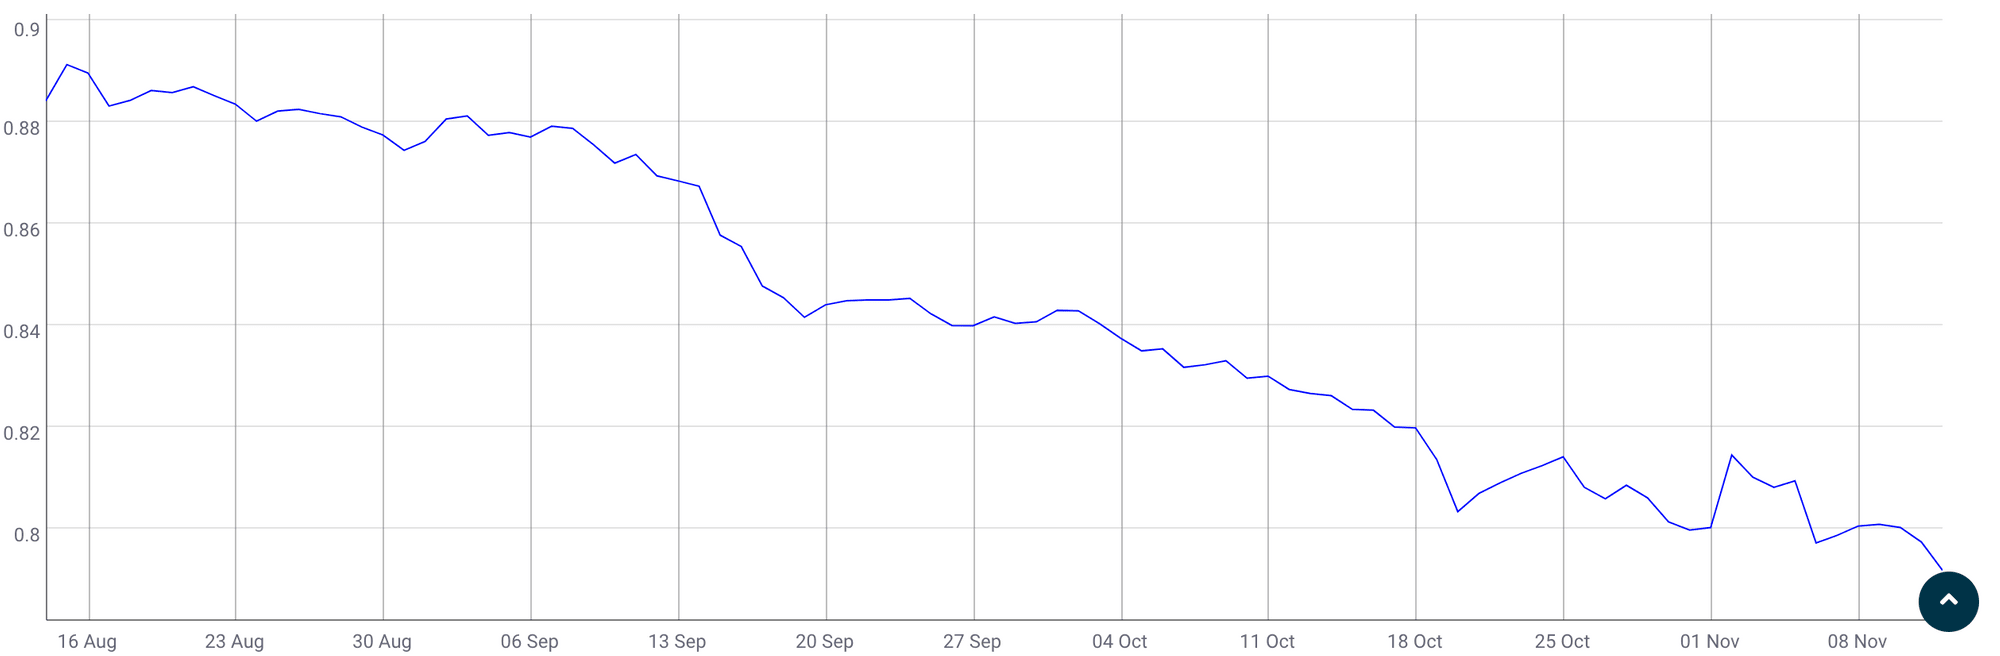 3 Months BTC ETH correlation